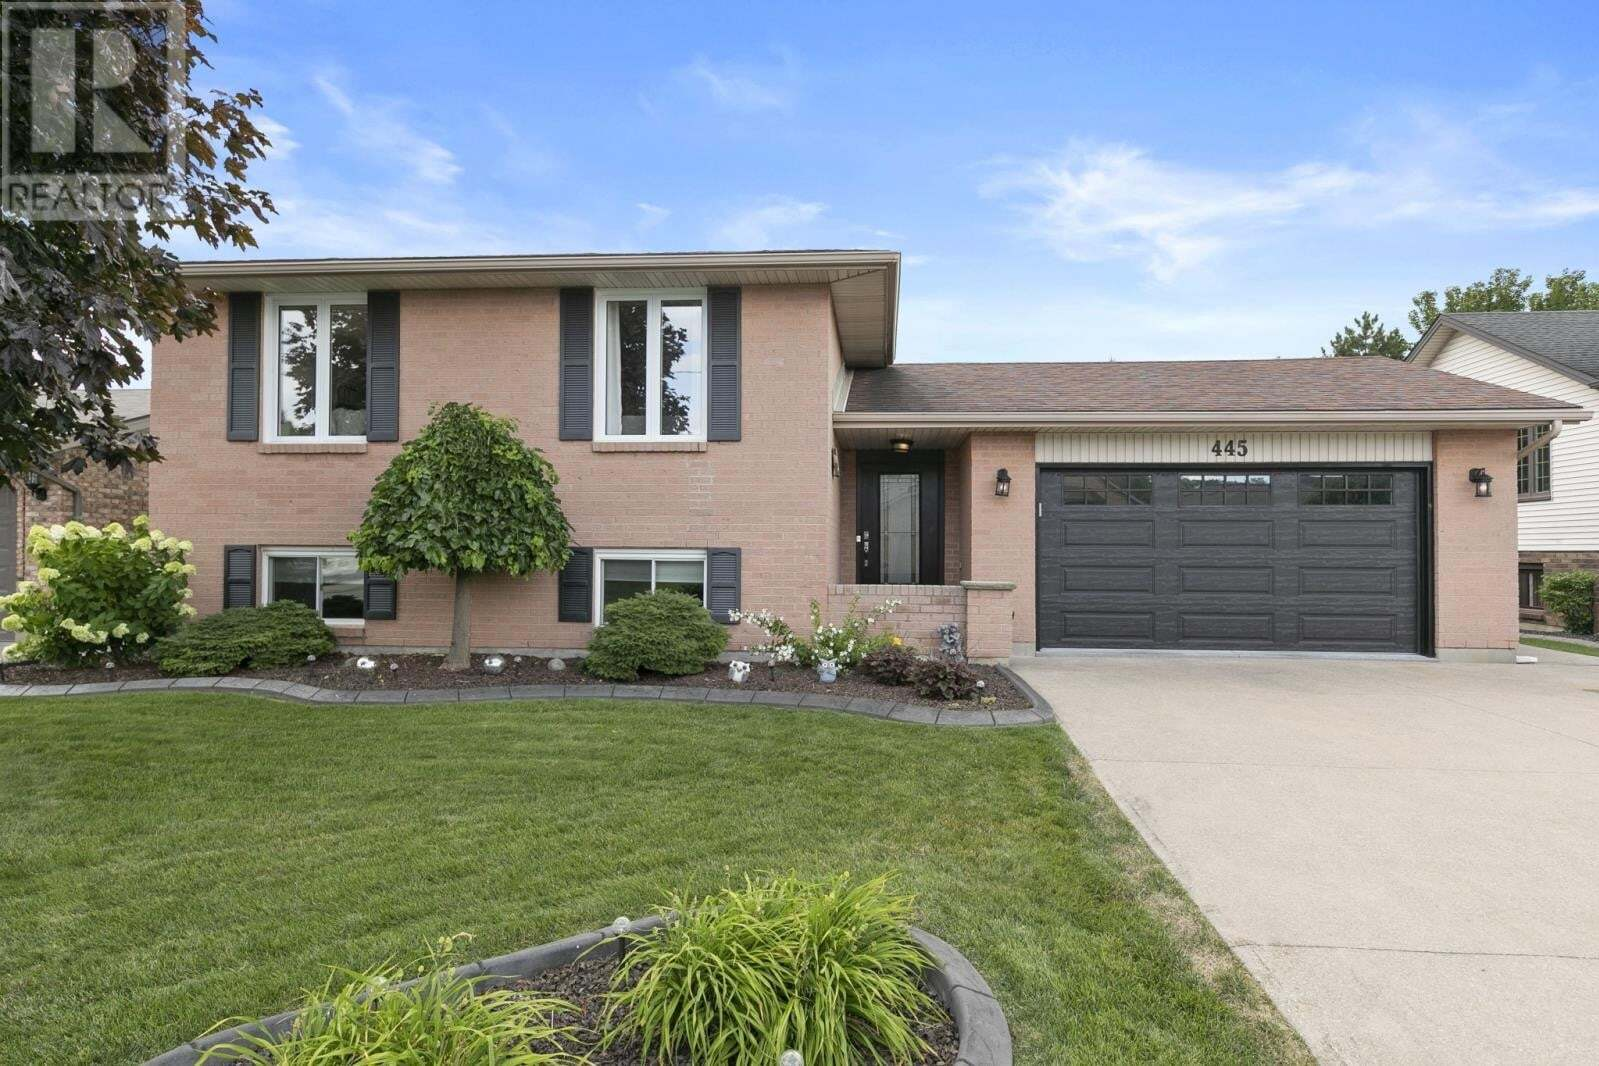 House for sale at 445 Lacasse  Tecumseh Ontario - MLS: 20009737